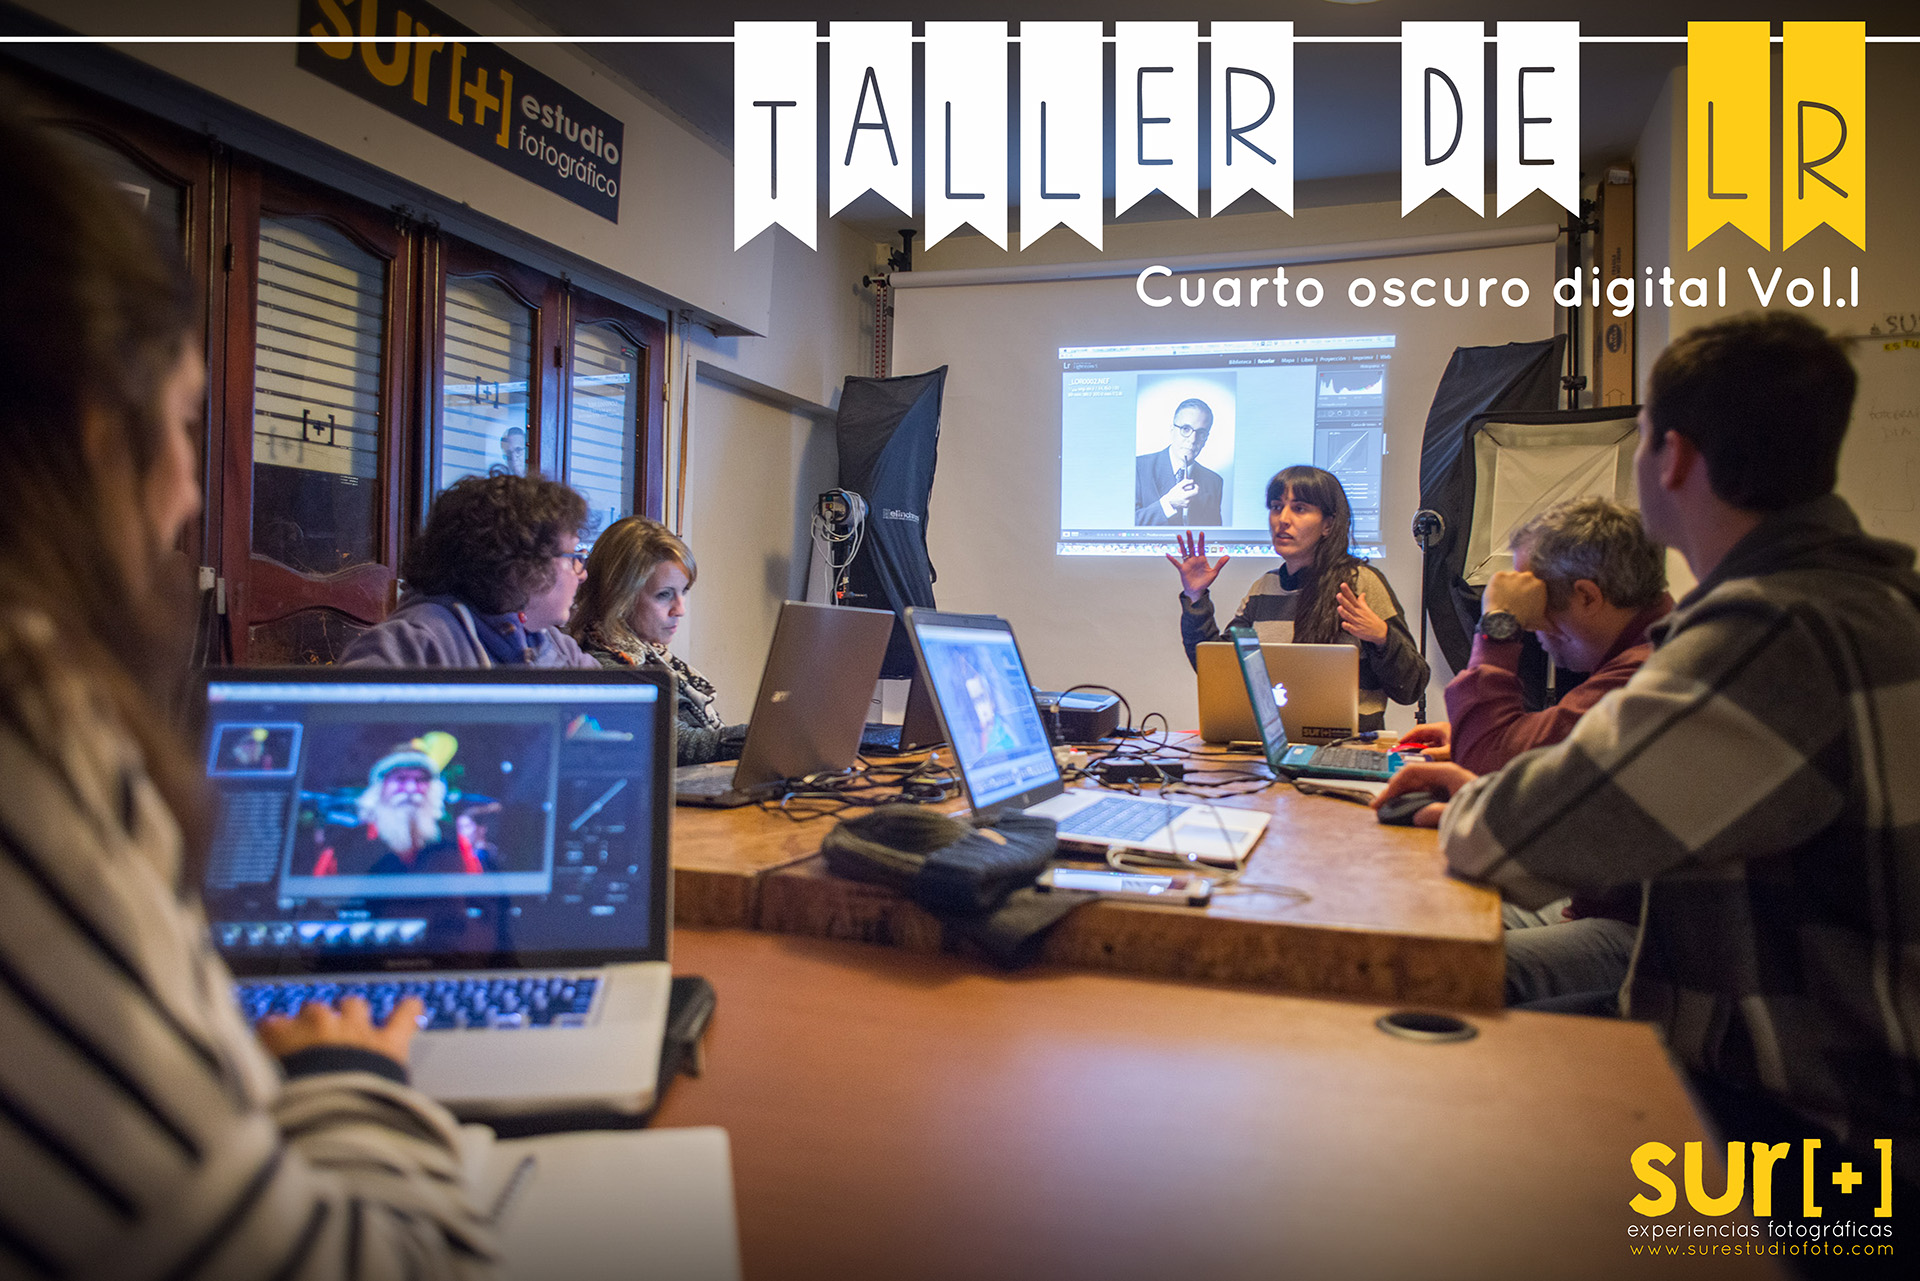 Taller de Lr - Cuarto oscuro digital - Docente: Lorena larriestra